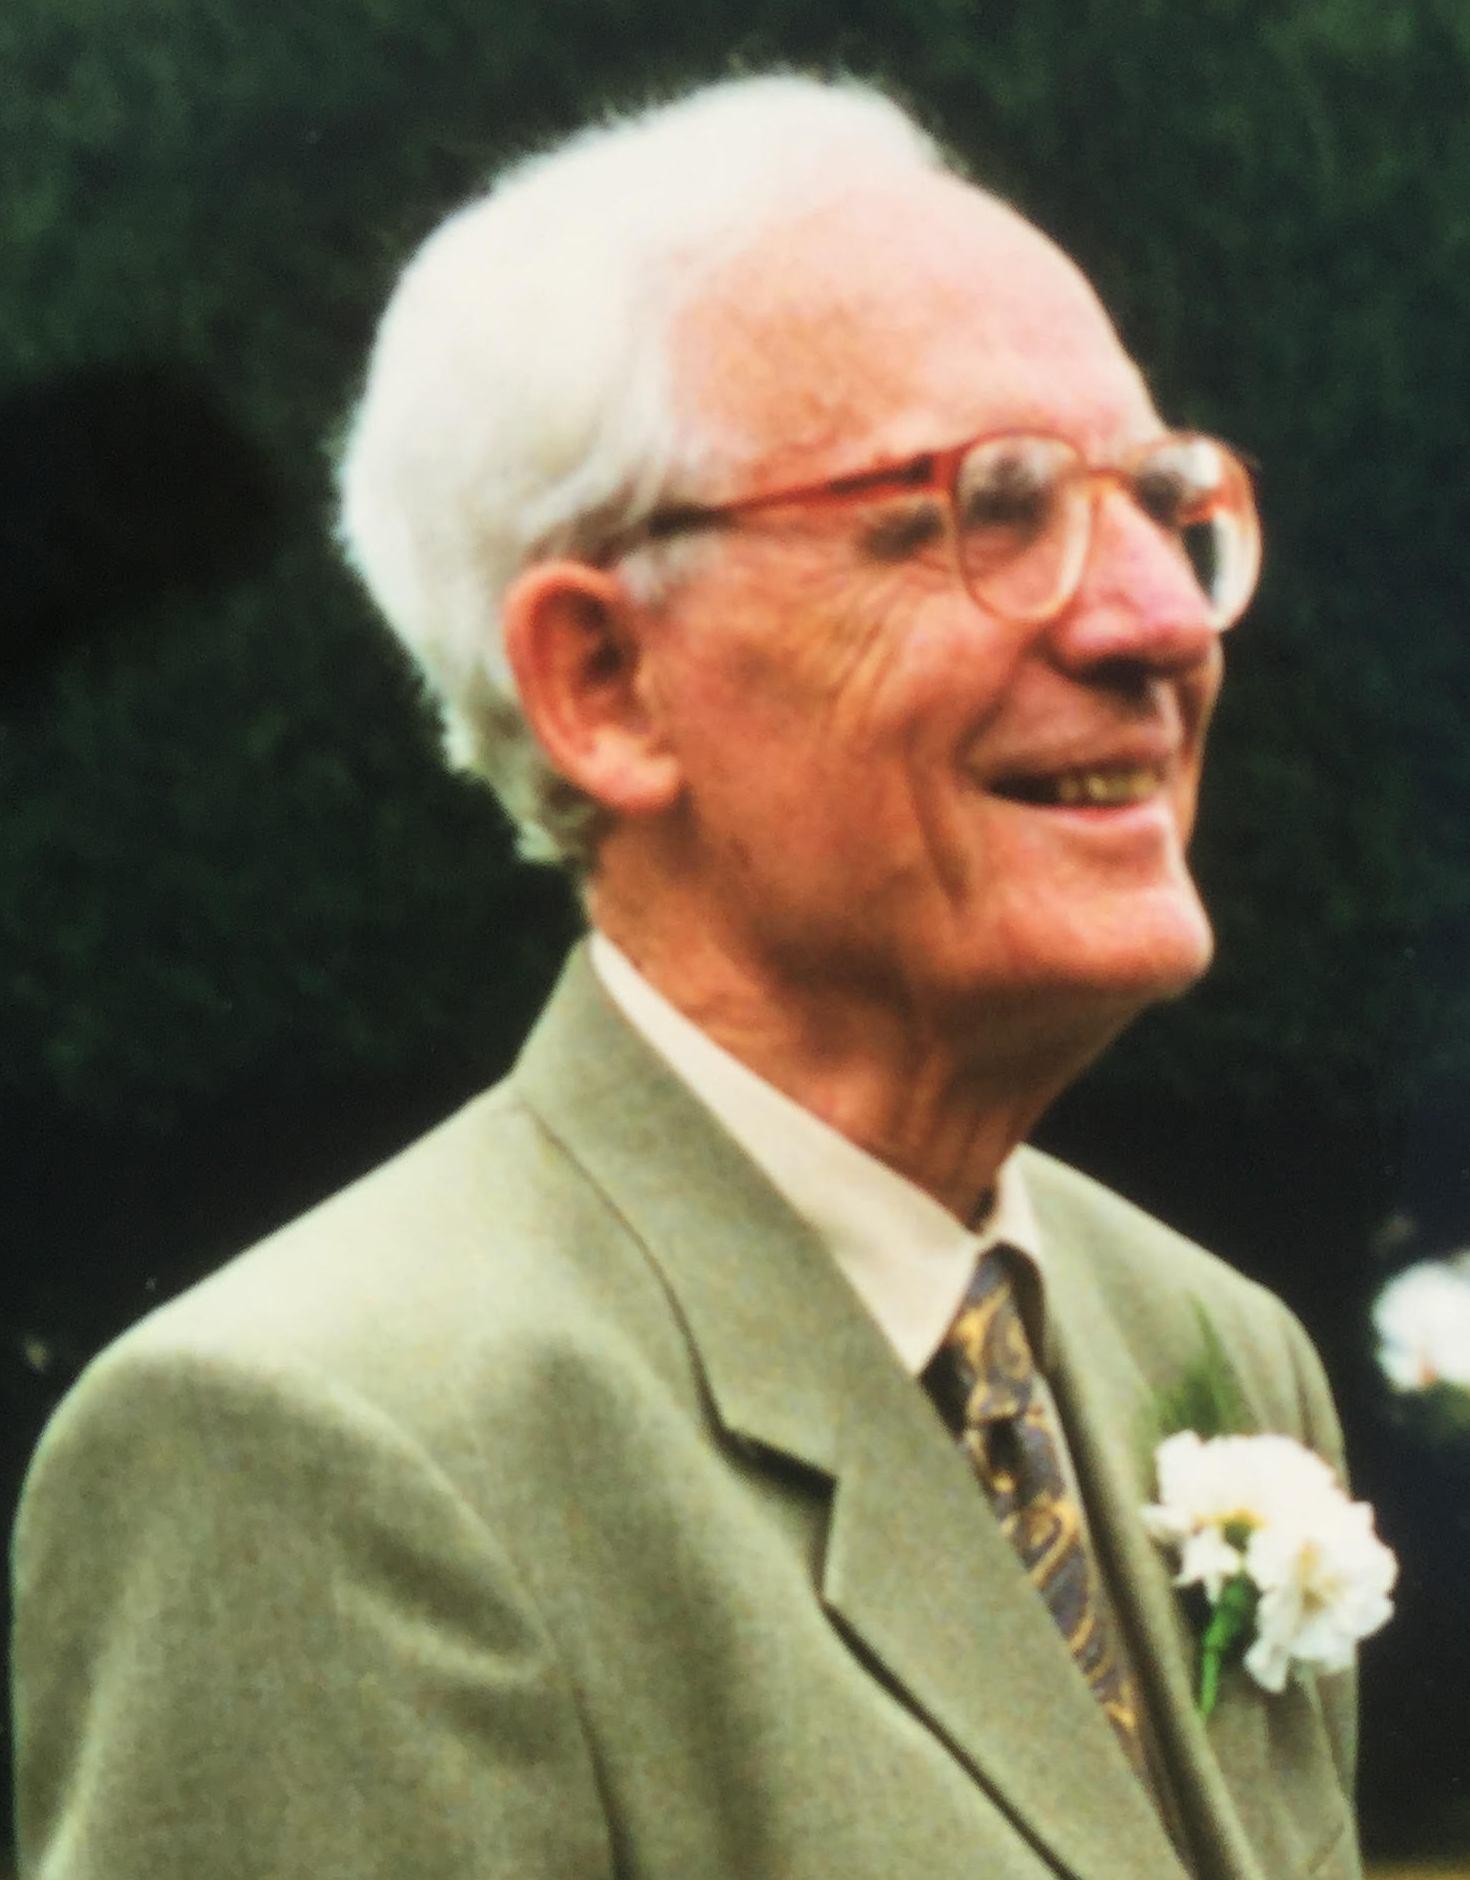 Harry Blamires 1998